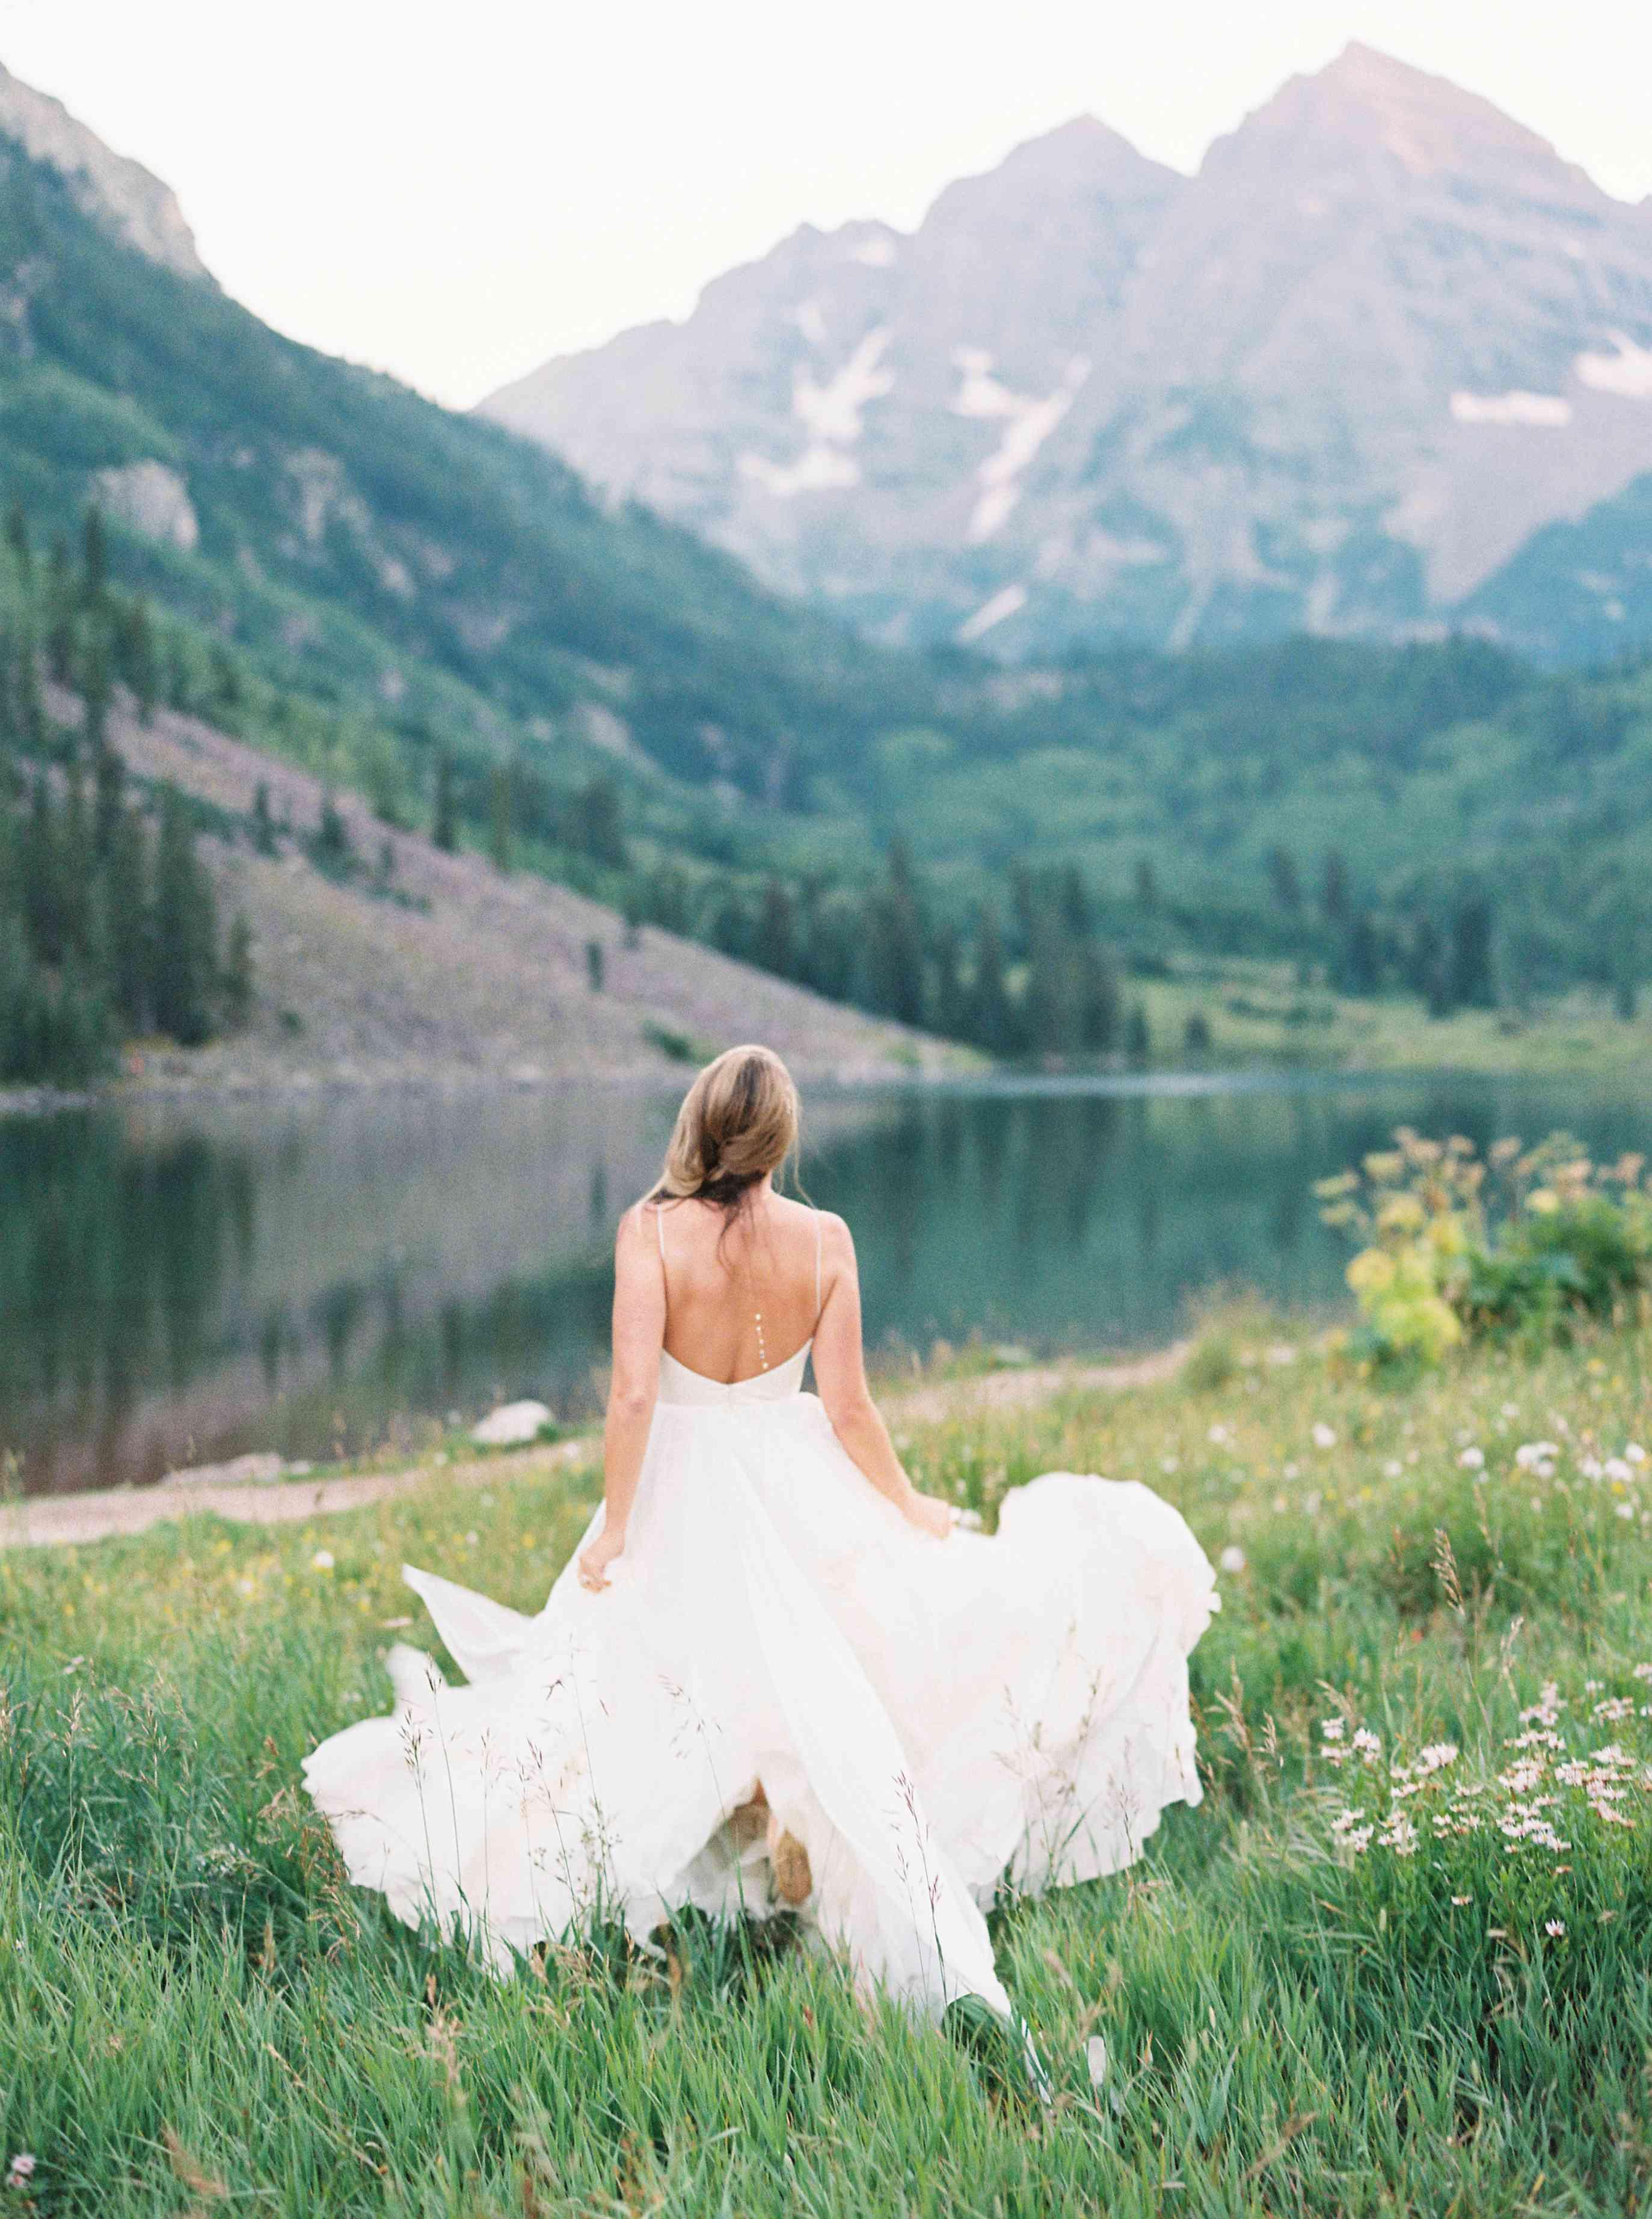 Bride in Leanne Marshall